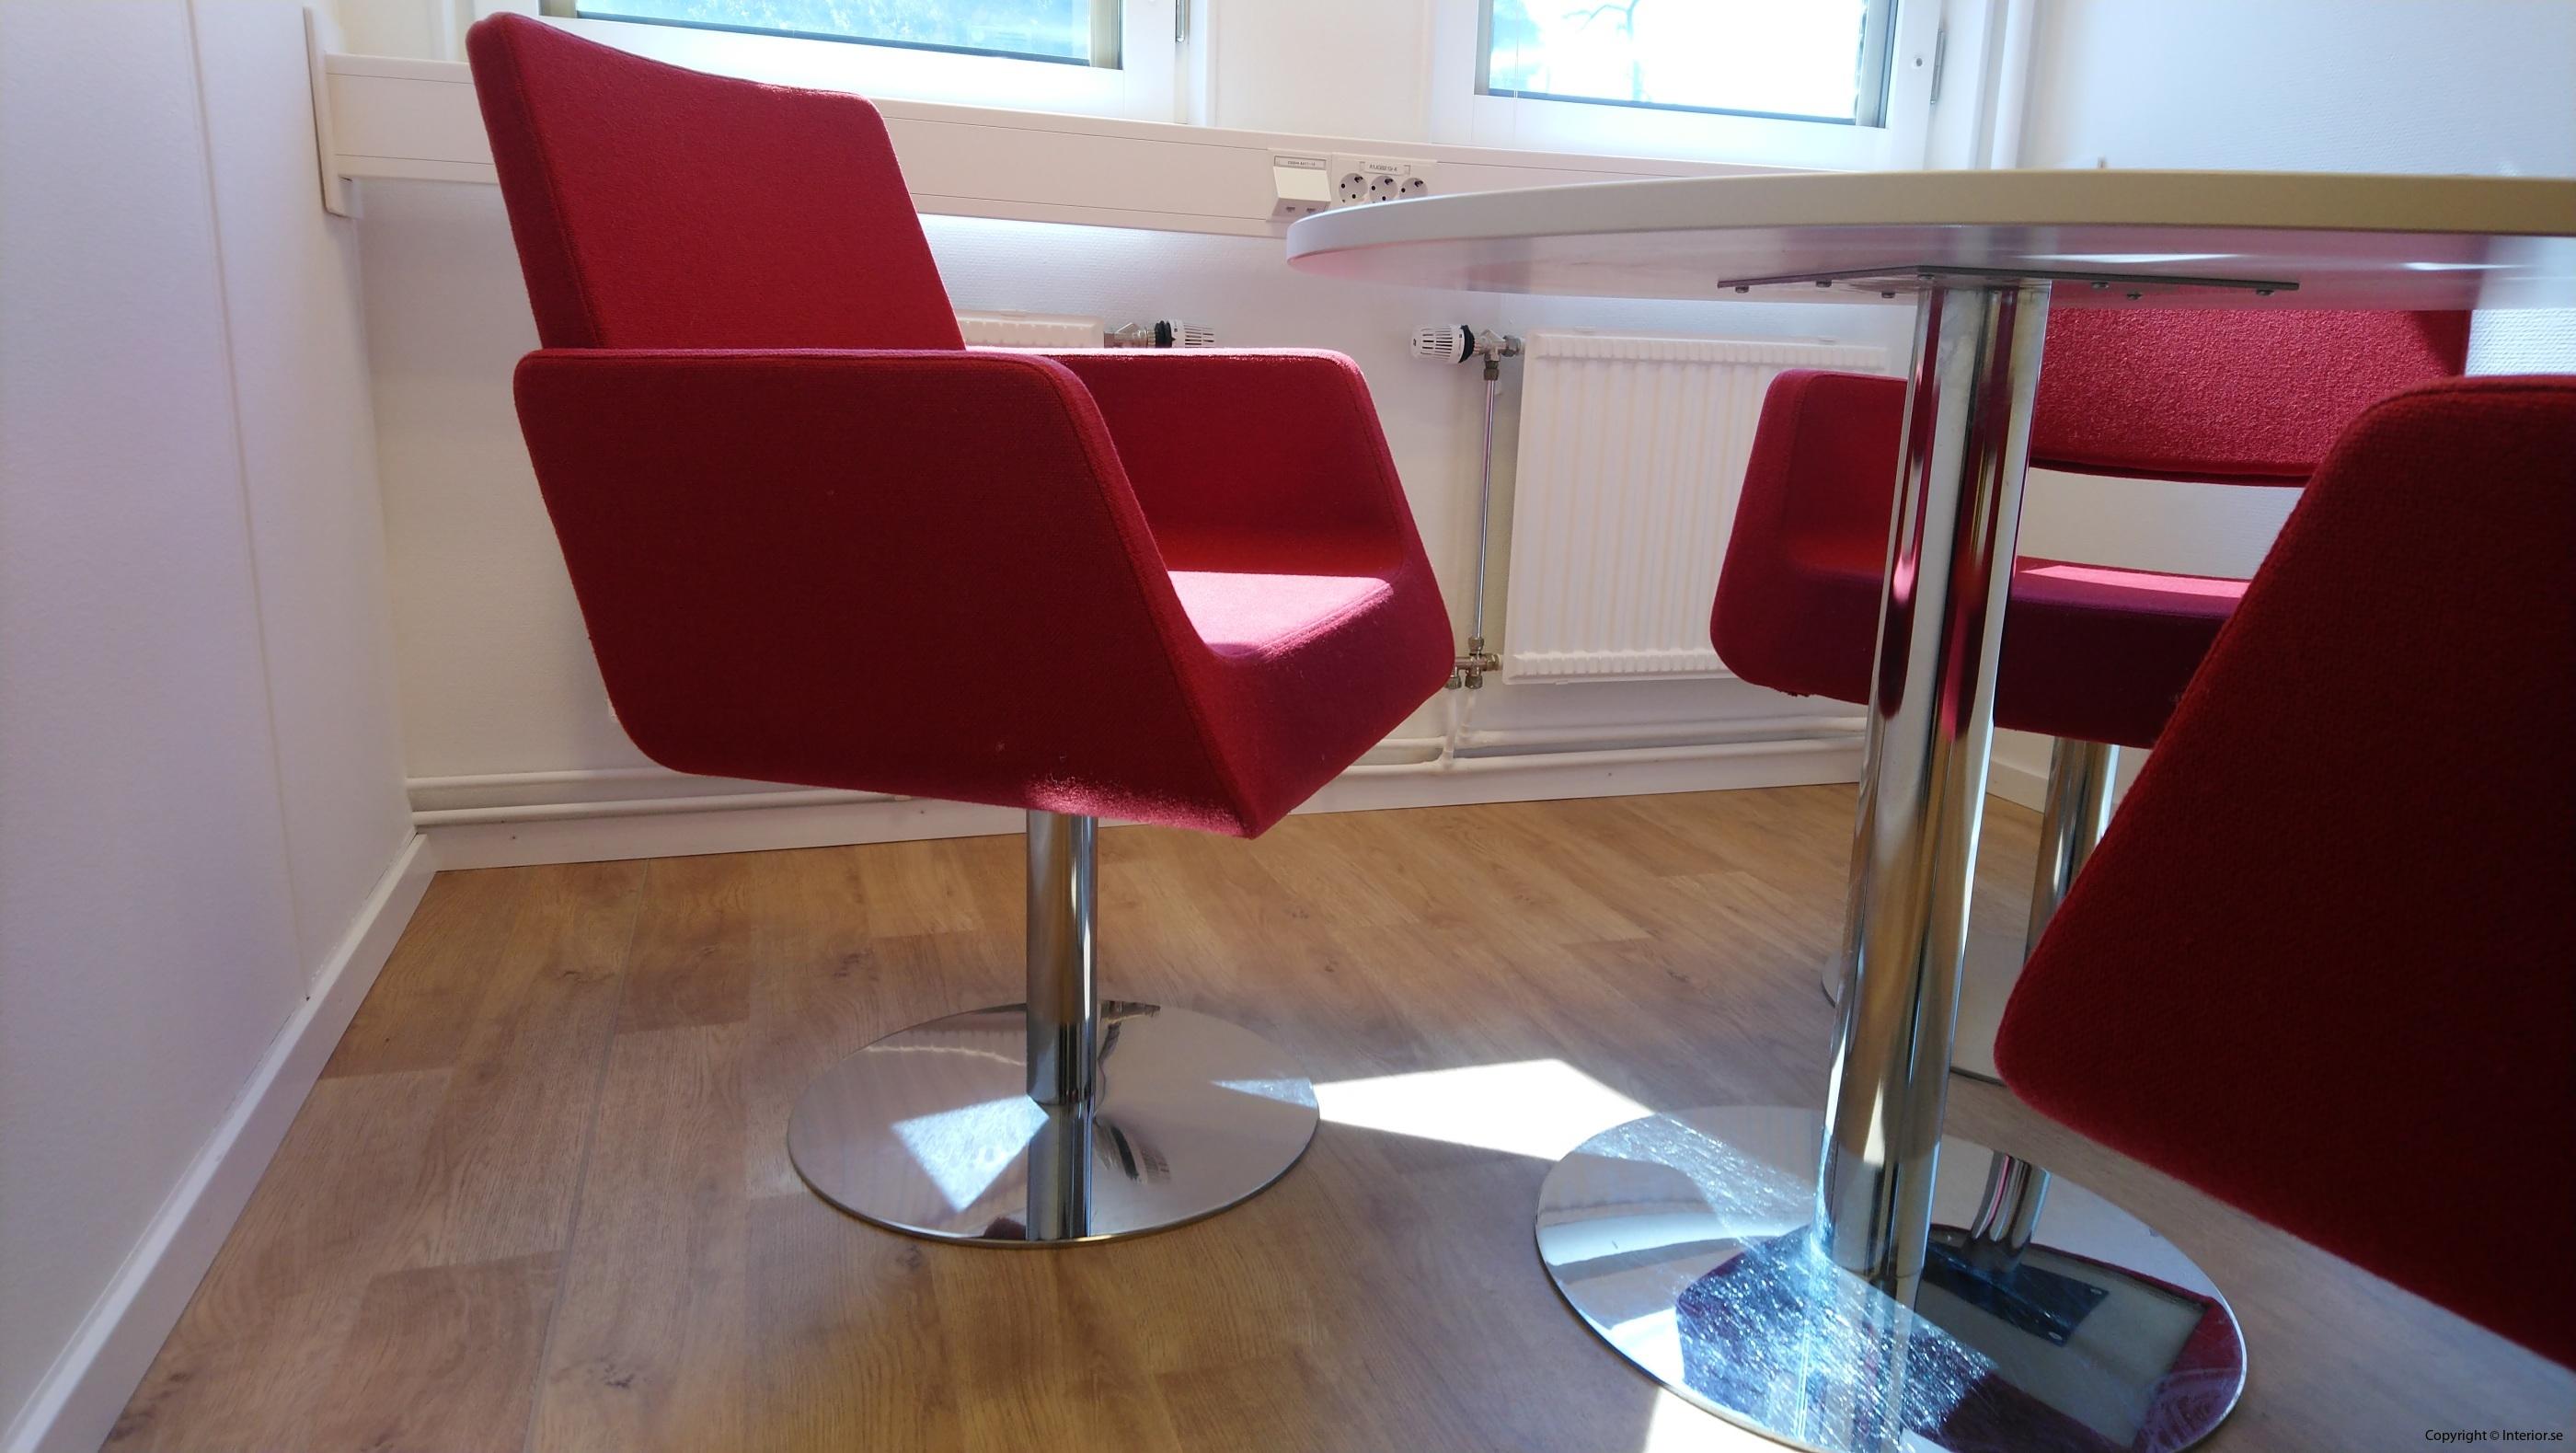 Loungegrupp, SA Möbler materia - 3 fåtöljer + bord - Loungemöbler begagnade designmöbler (2)